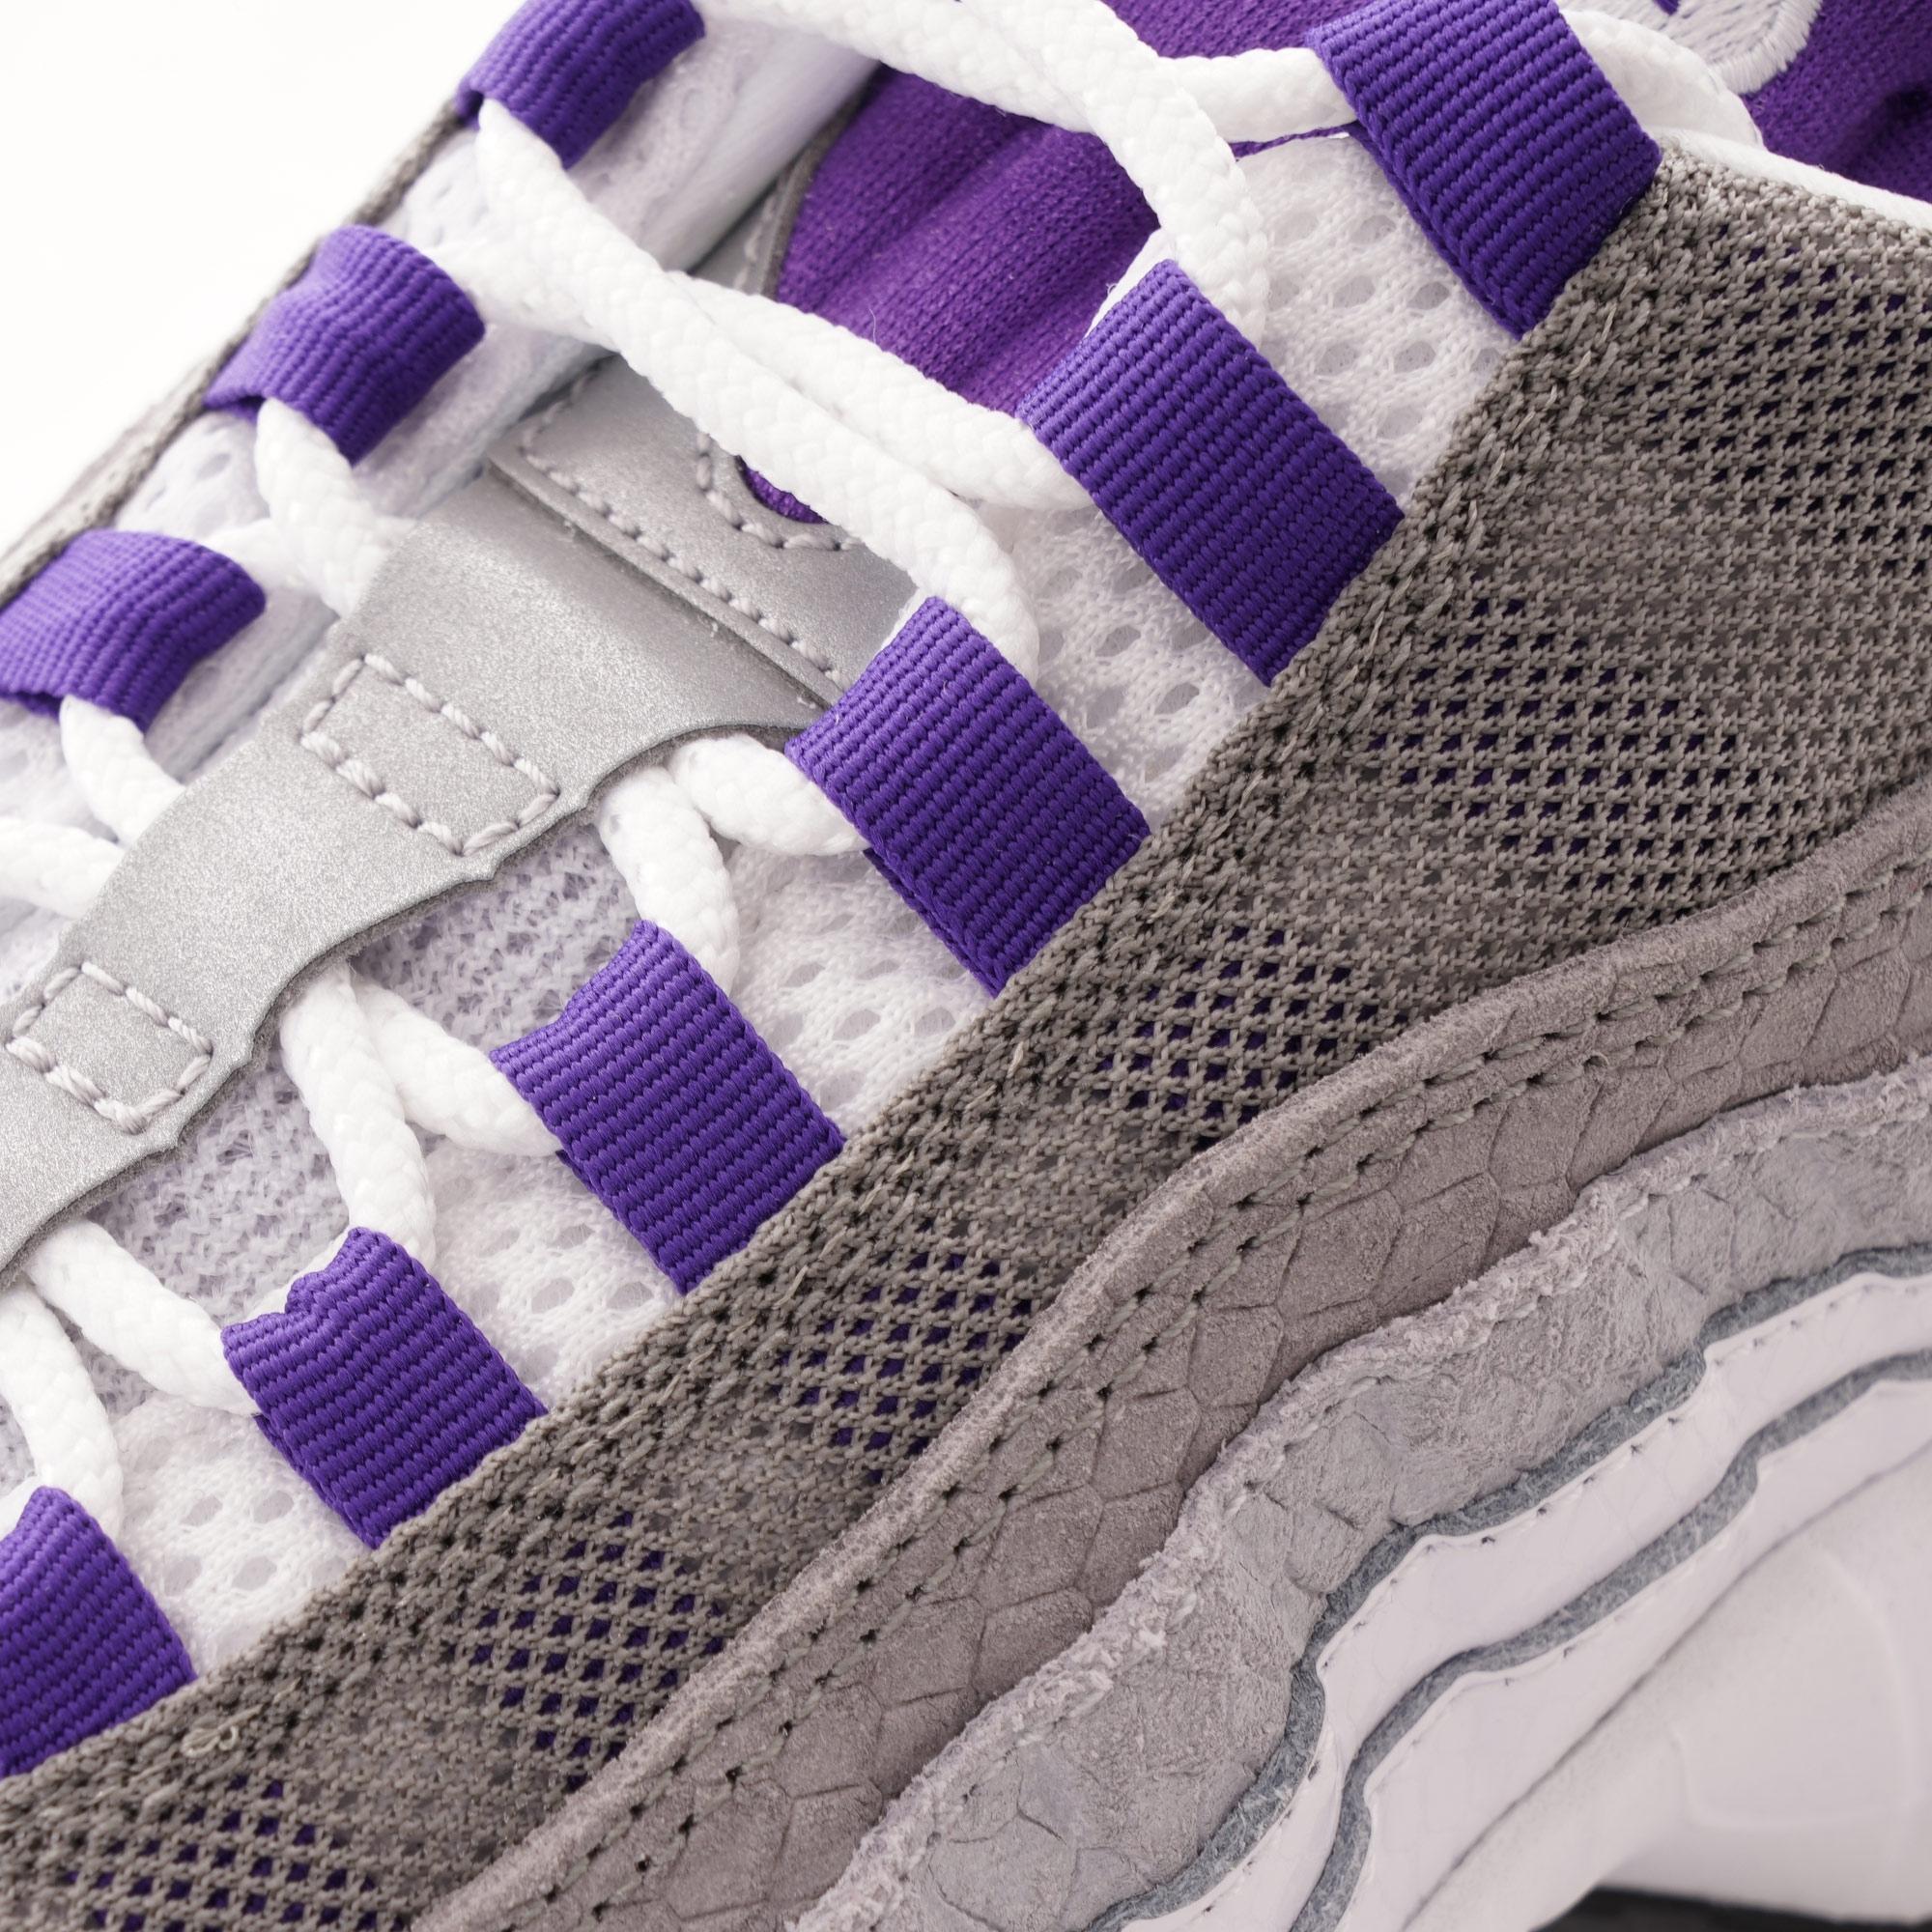 Nike Air Max 95 Lv8 Low top Sneakers Whitecourt Purple